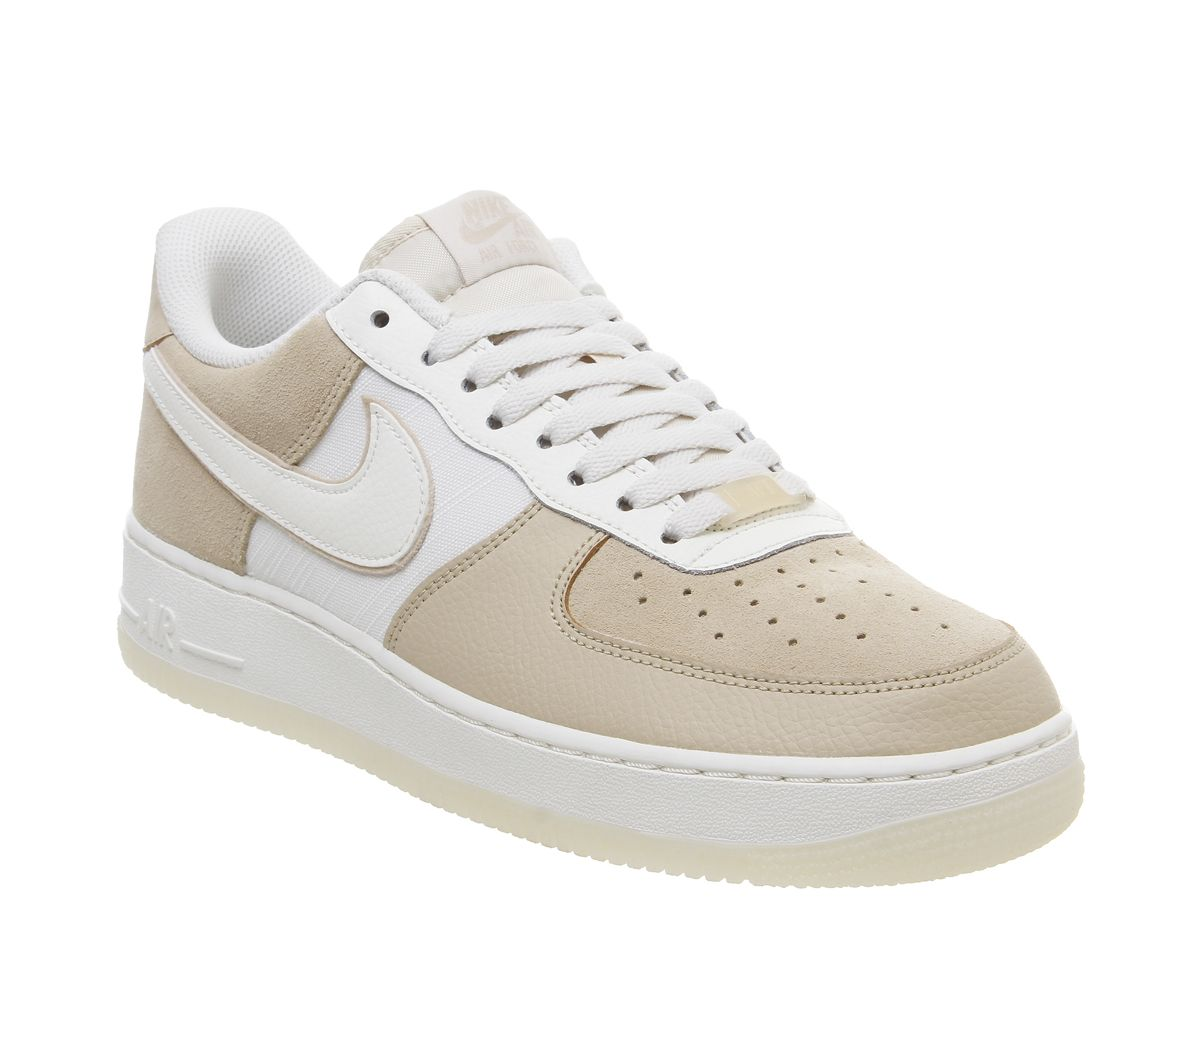 ea0071fc Nike Air Force 1 Lv8 Trainers Desert Ore Sail Light Cream Pale Ivory ...